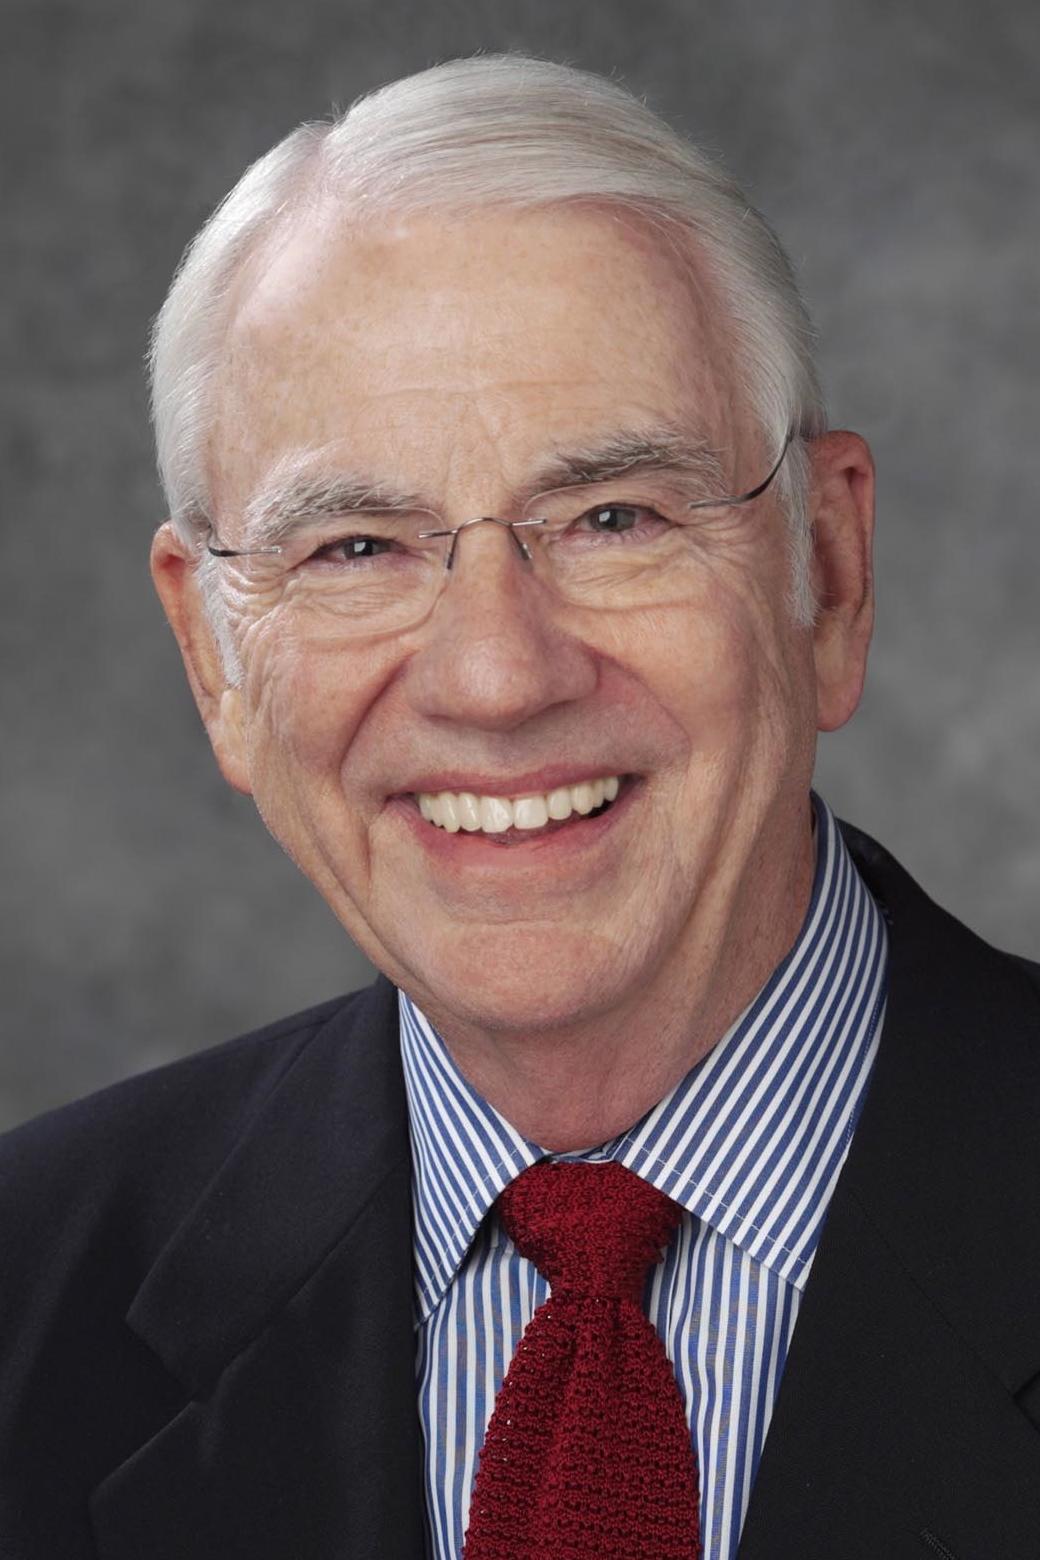 Charles W. Powers